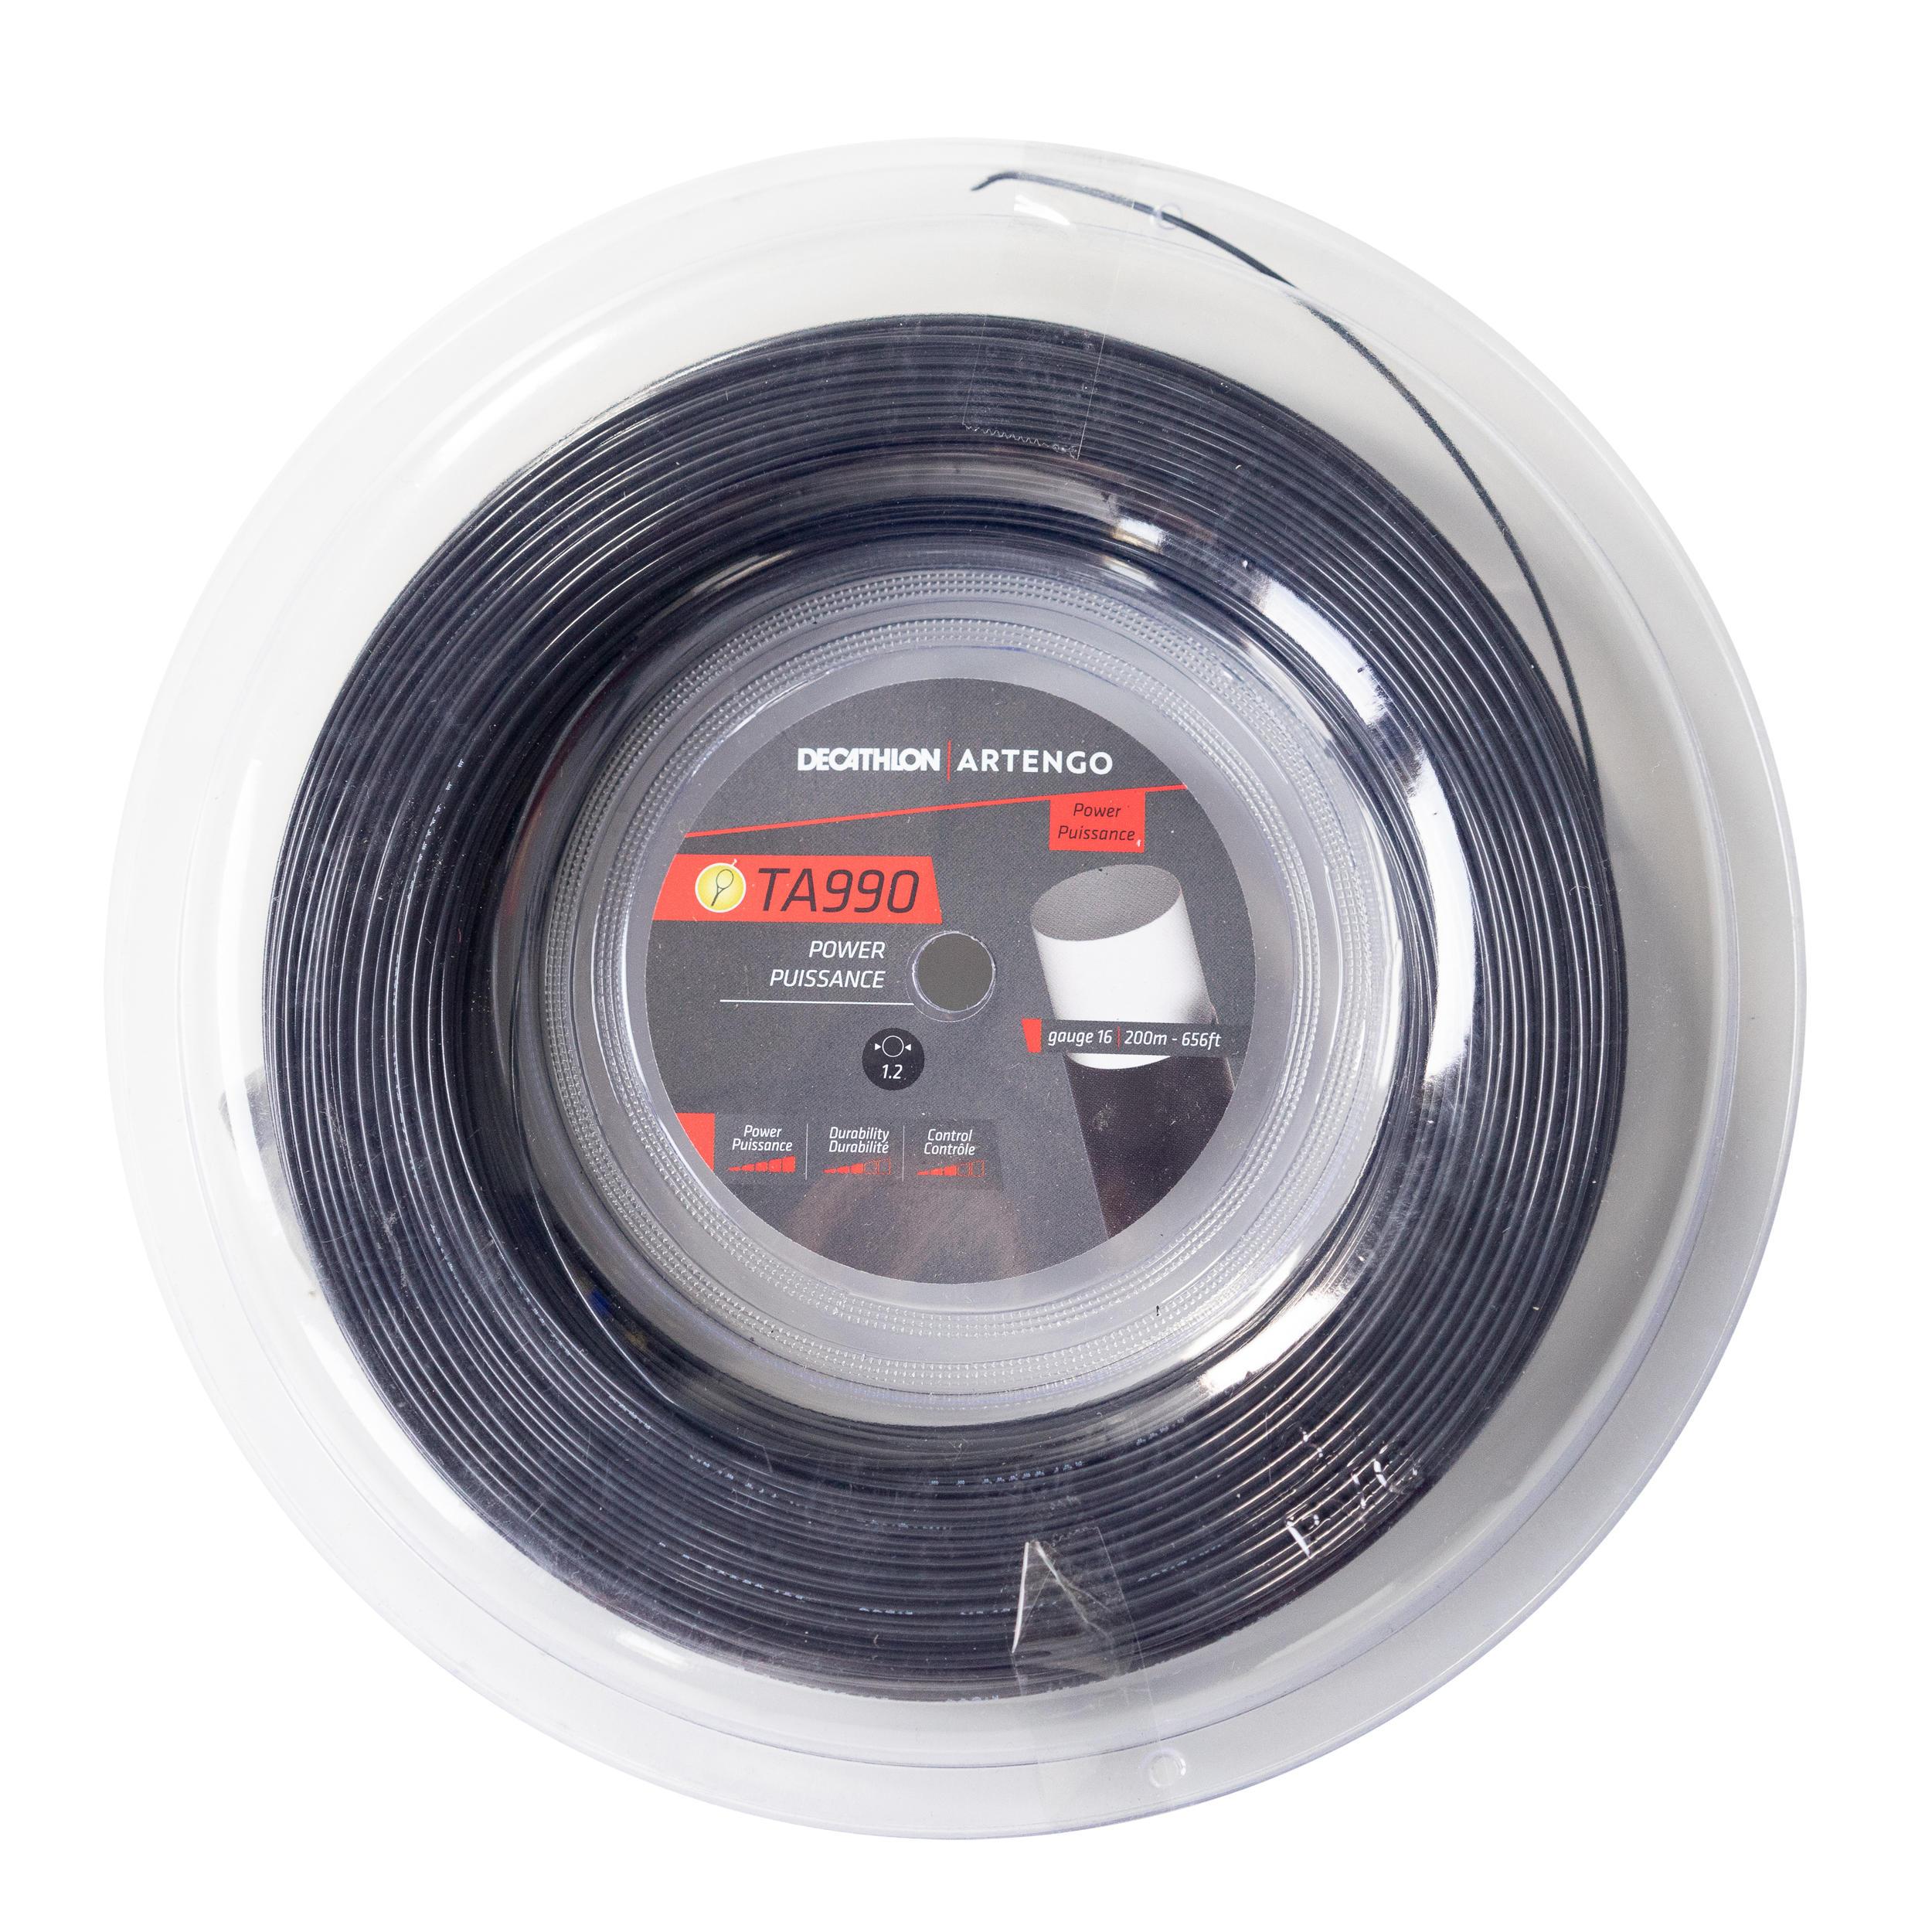 Tecnifibre Black Code 4S cuerda para raqueta de tenis-negro-200m carrete